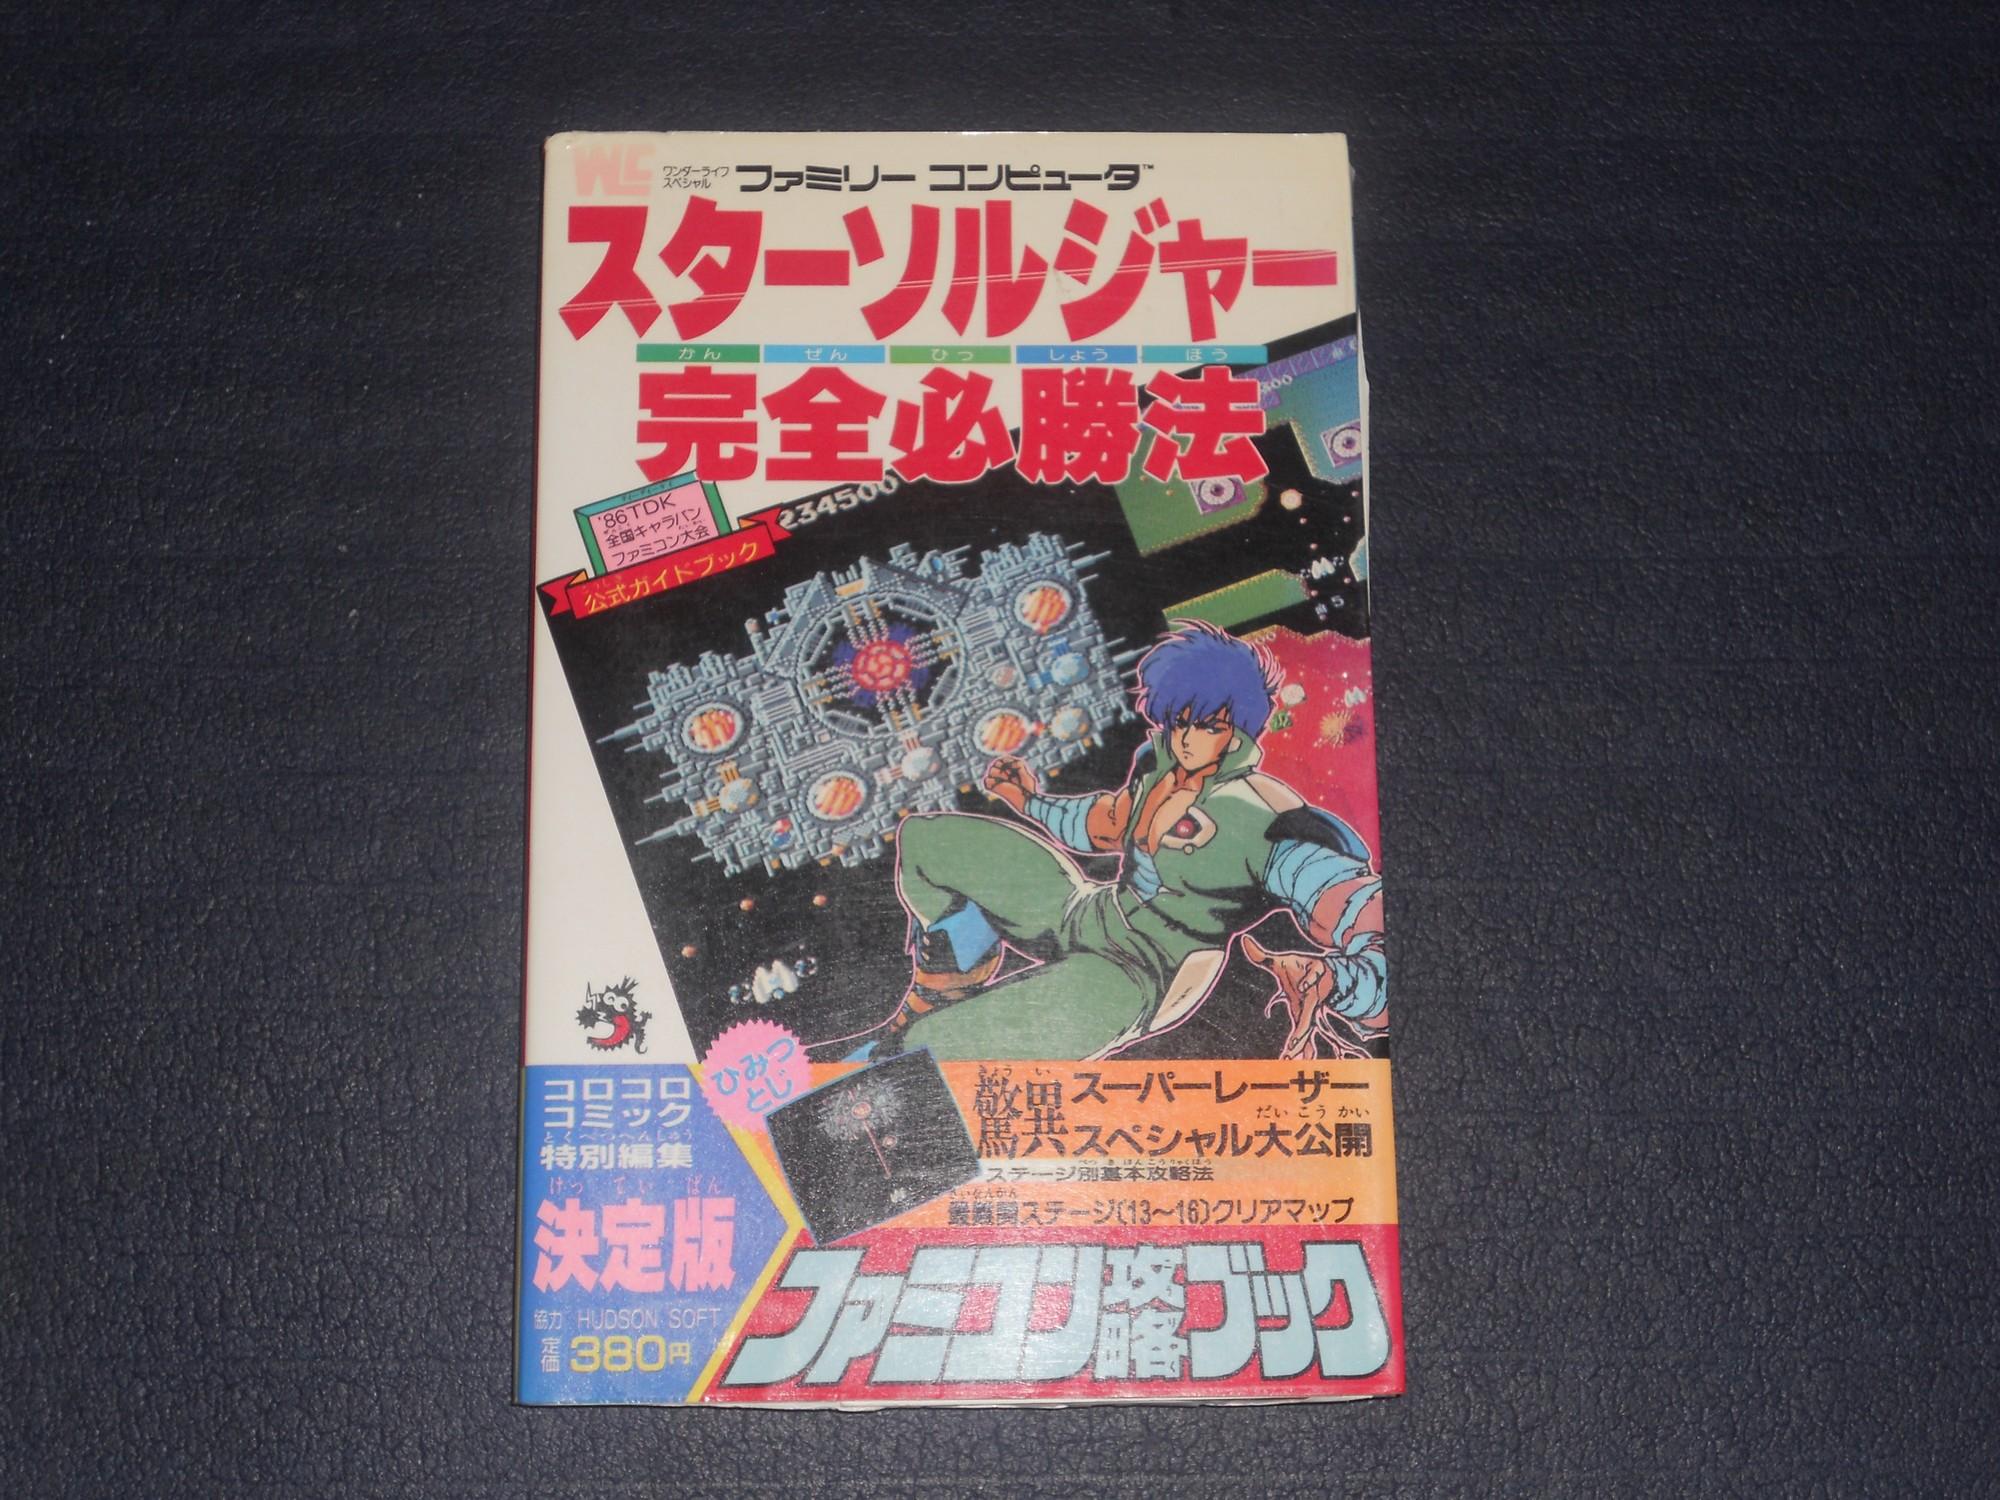 Guide Book, Mook, Mag, Livre ZLJFA2